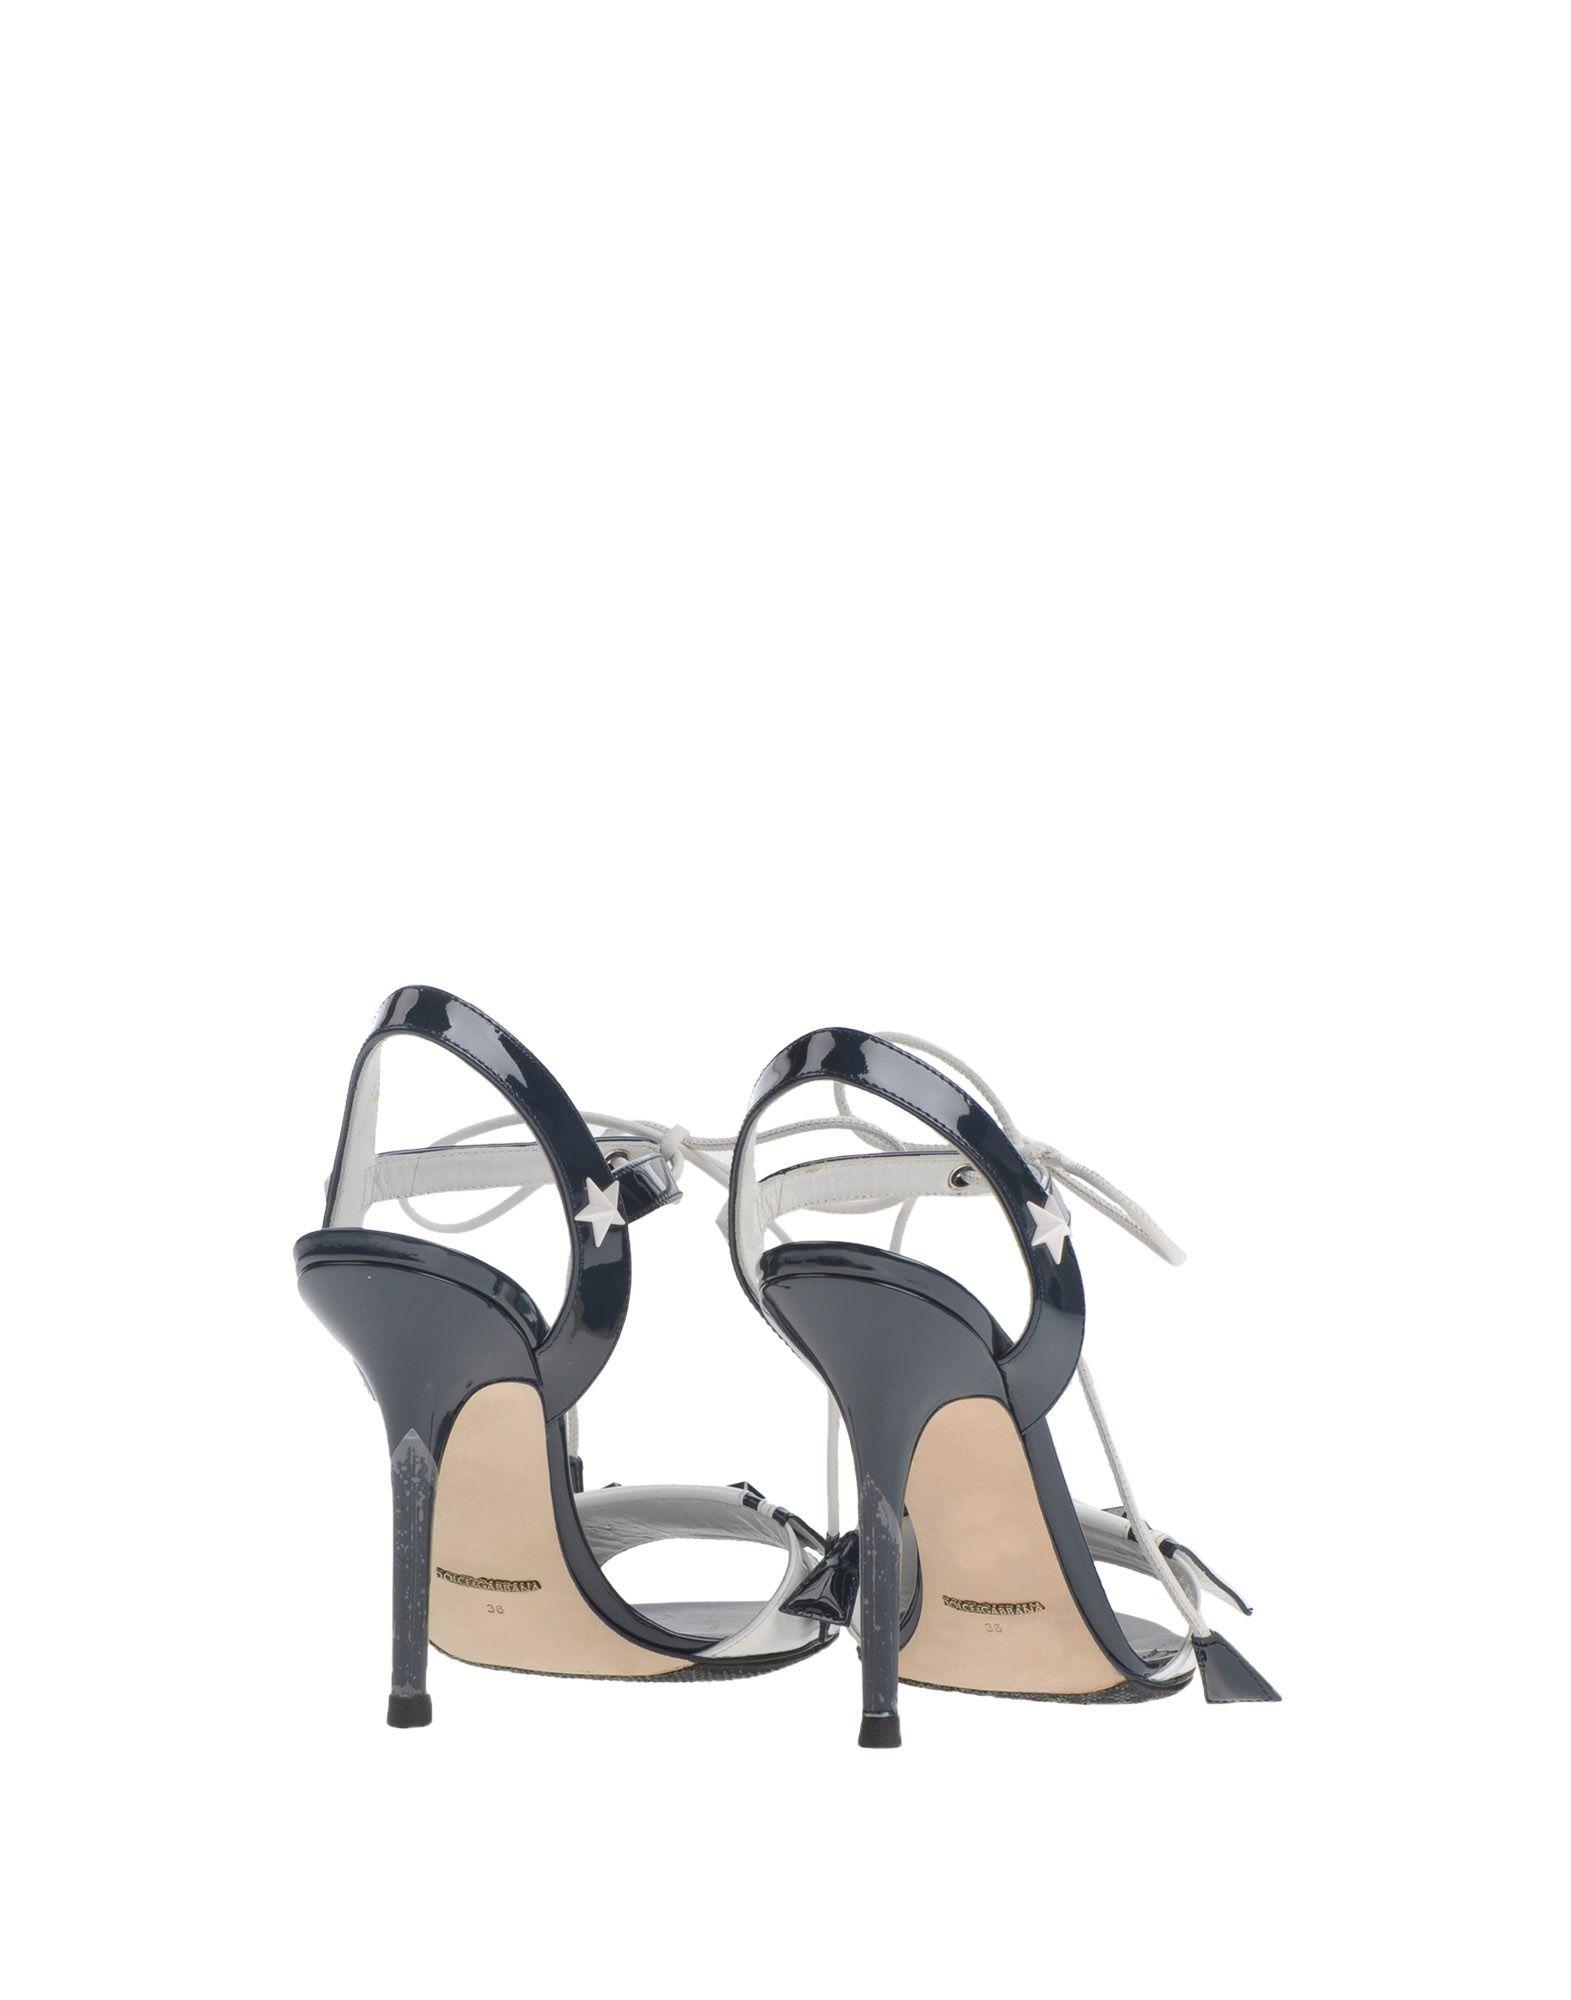 dolce & amp; gabbana sandales - femmes femmes femmes dolce & amp; gabbana sandales en ligne sur canada 49b66a